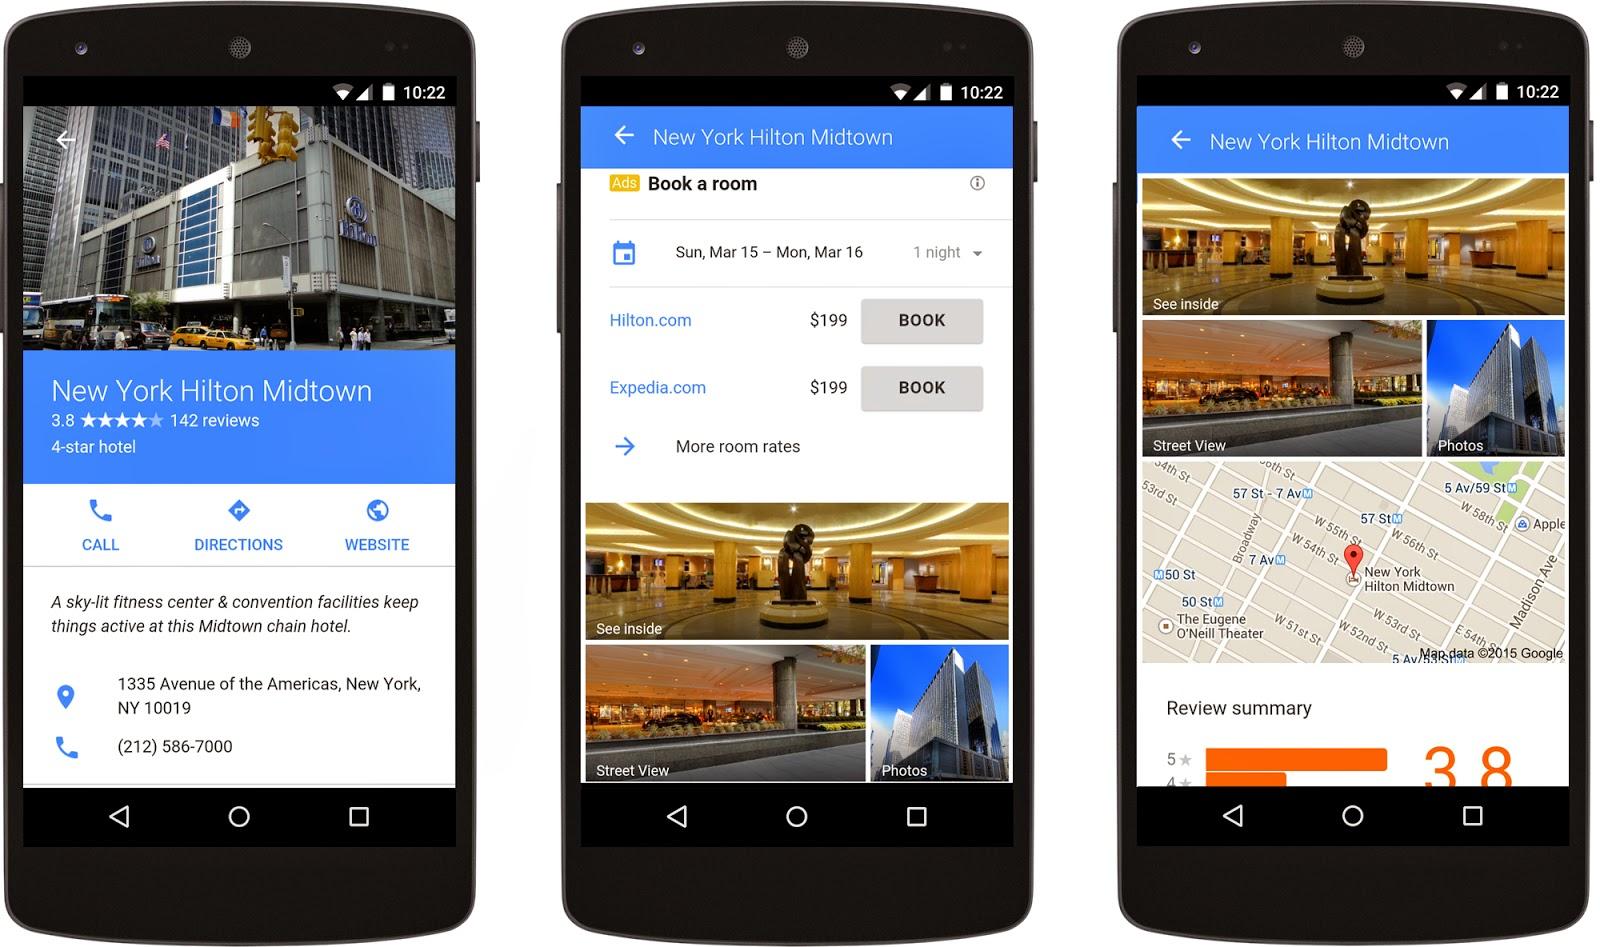 recherches-mobiles-google-2015